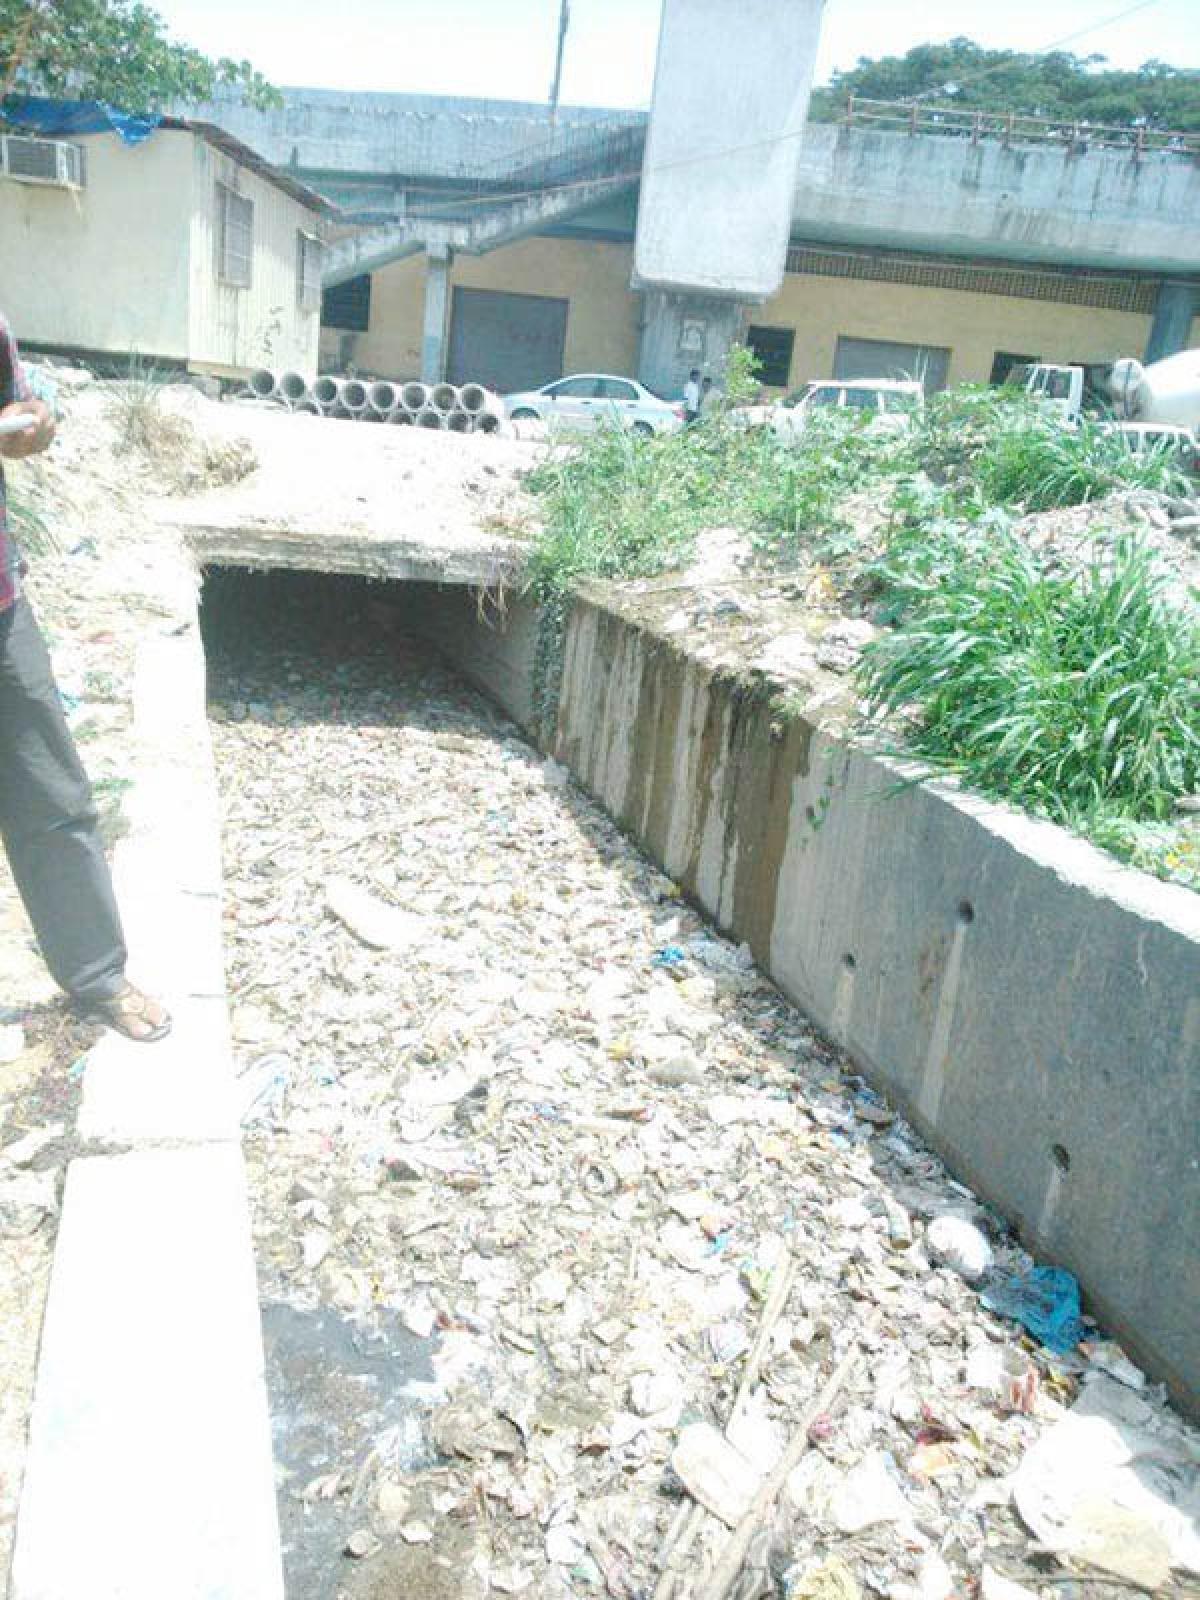 Bhopal: Chocked nullah posing health threat to ashram inmates